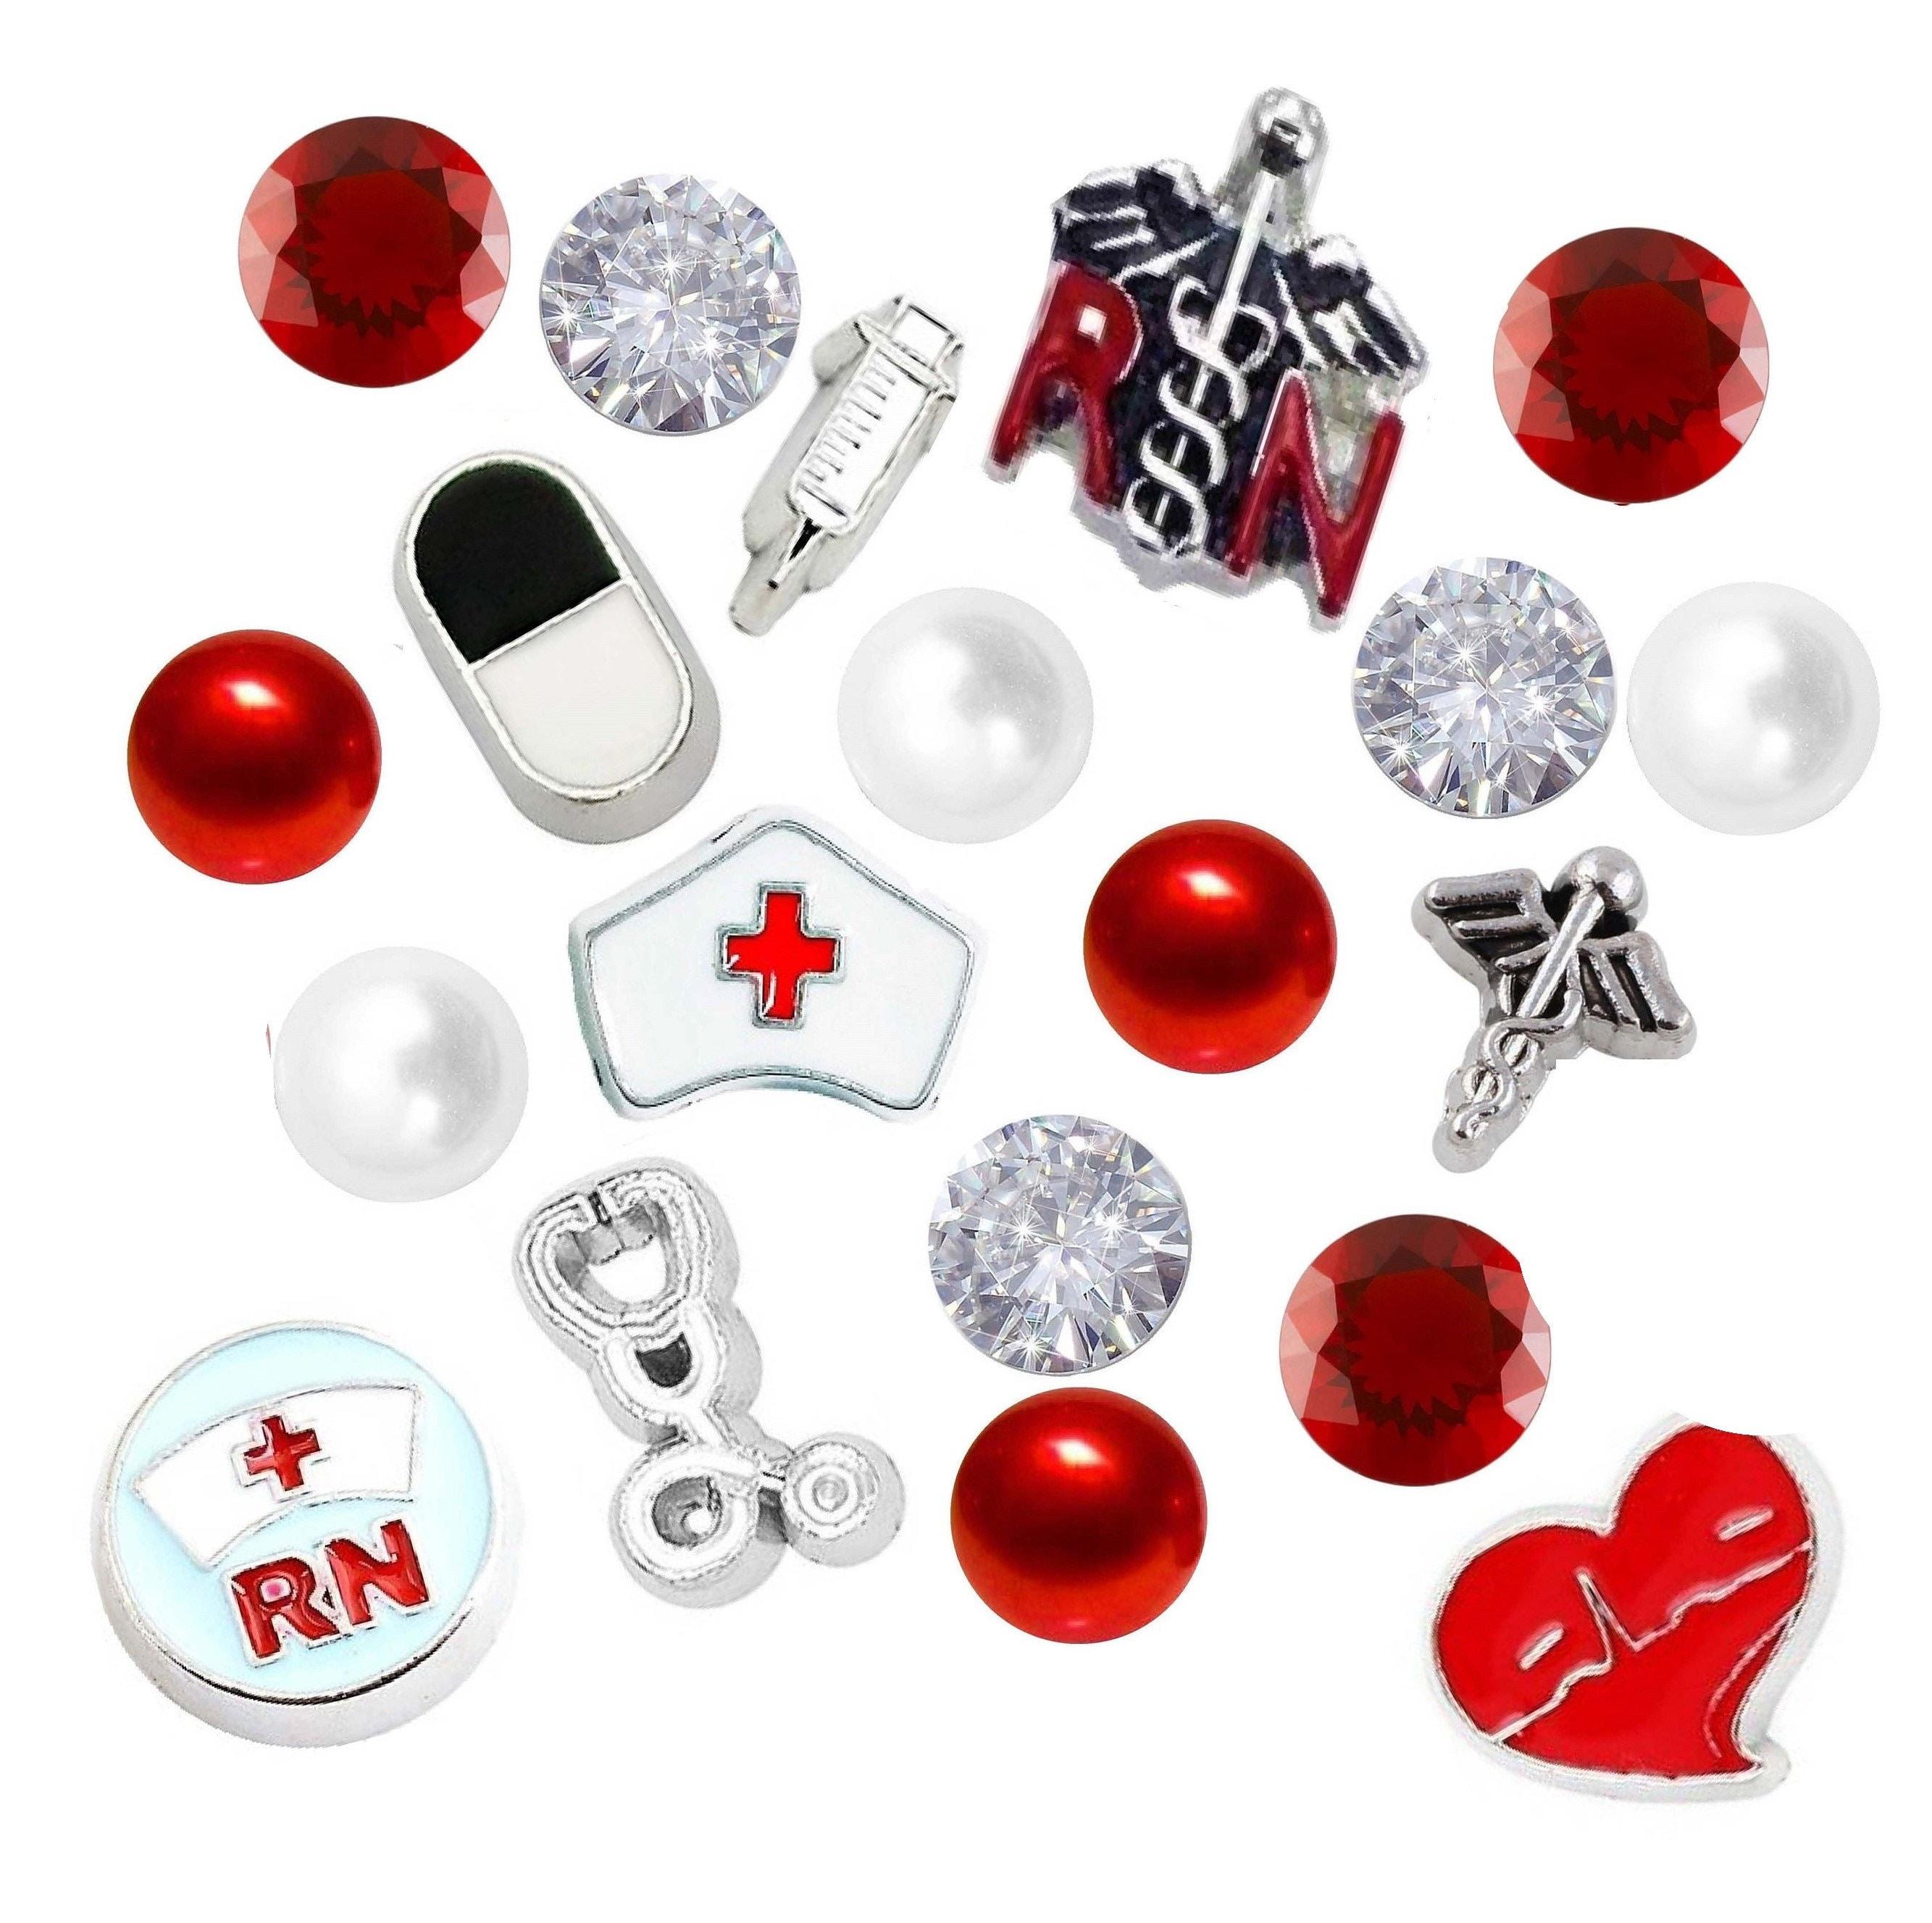 a9582716813 Nurse Cap Medical Symbol RN Caduceus Floating Charms 6   Etsy